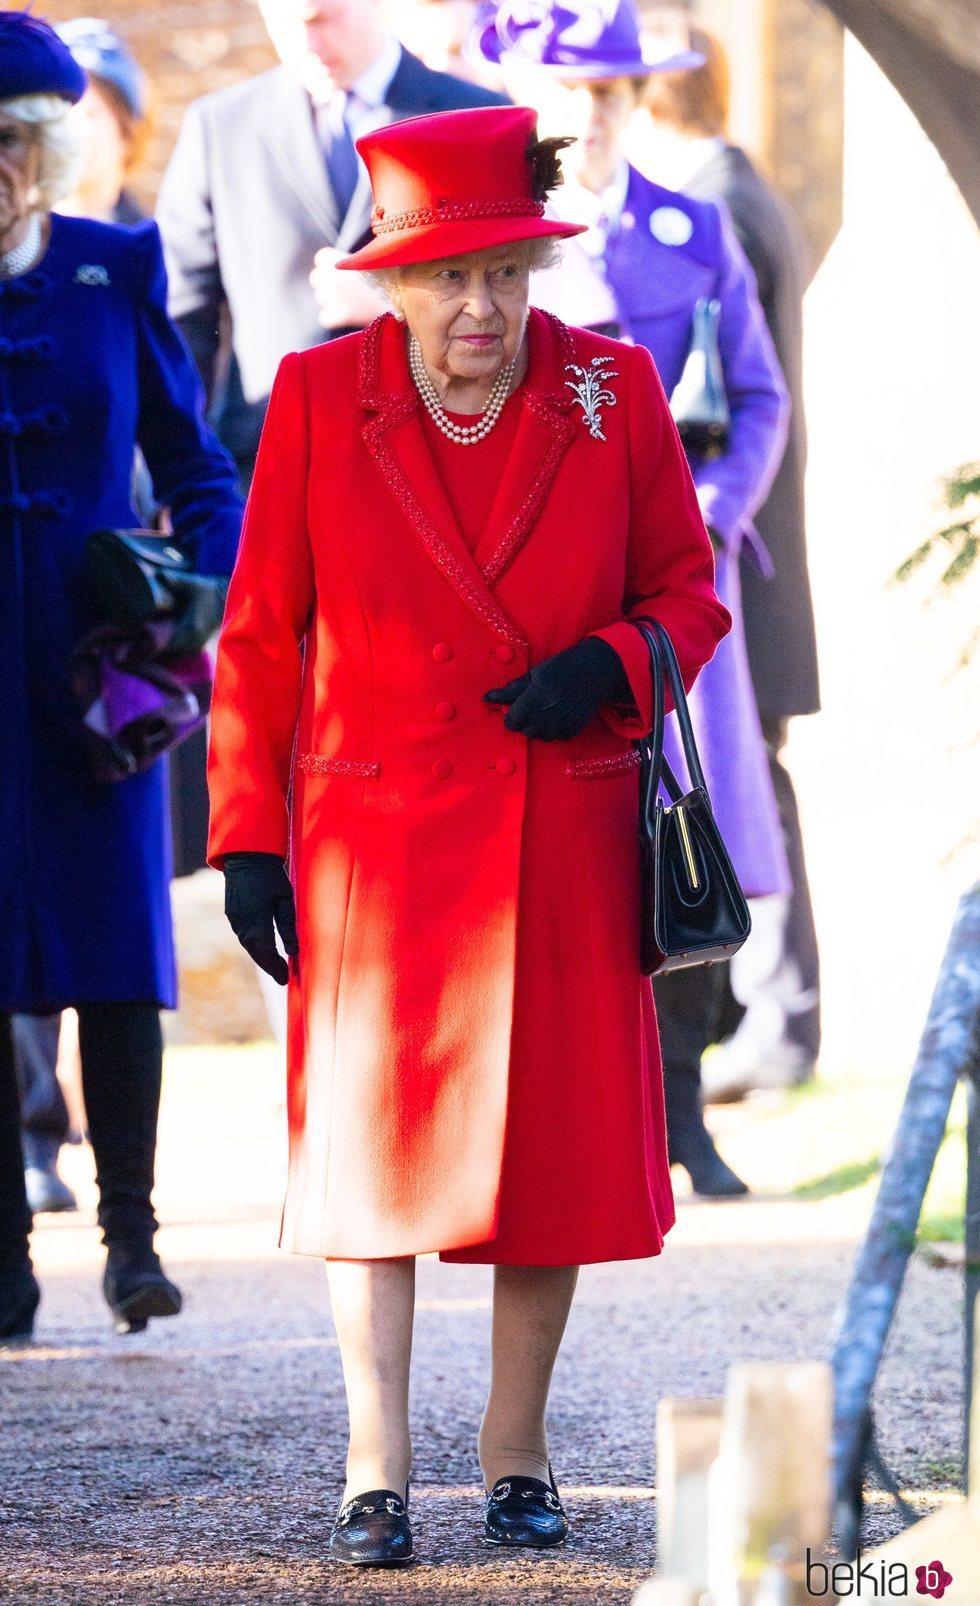 La Reina Isabel en la Misa de Navidad 2019